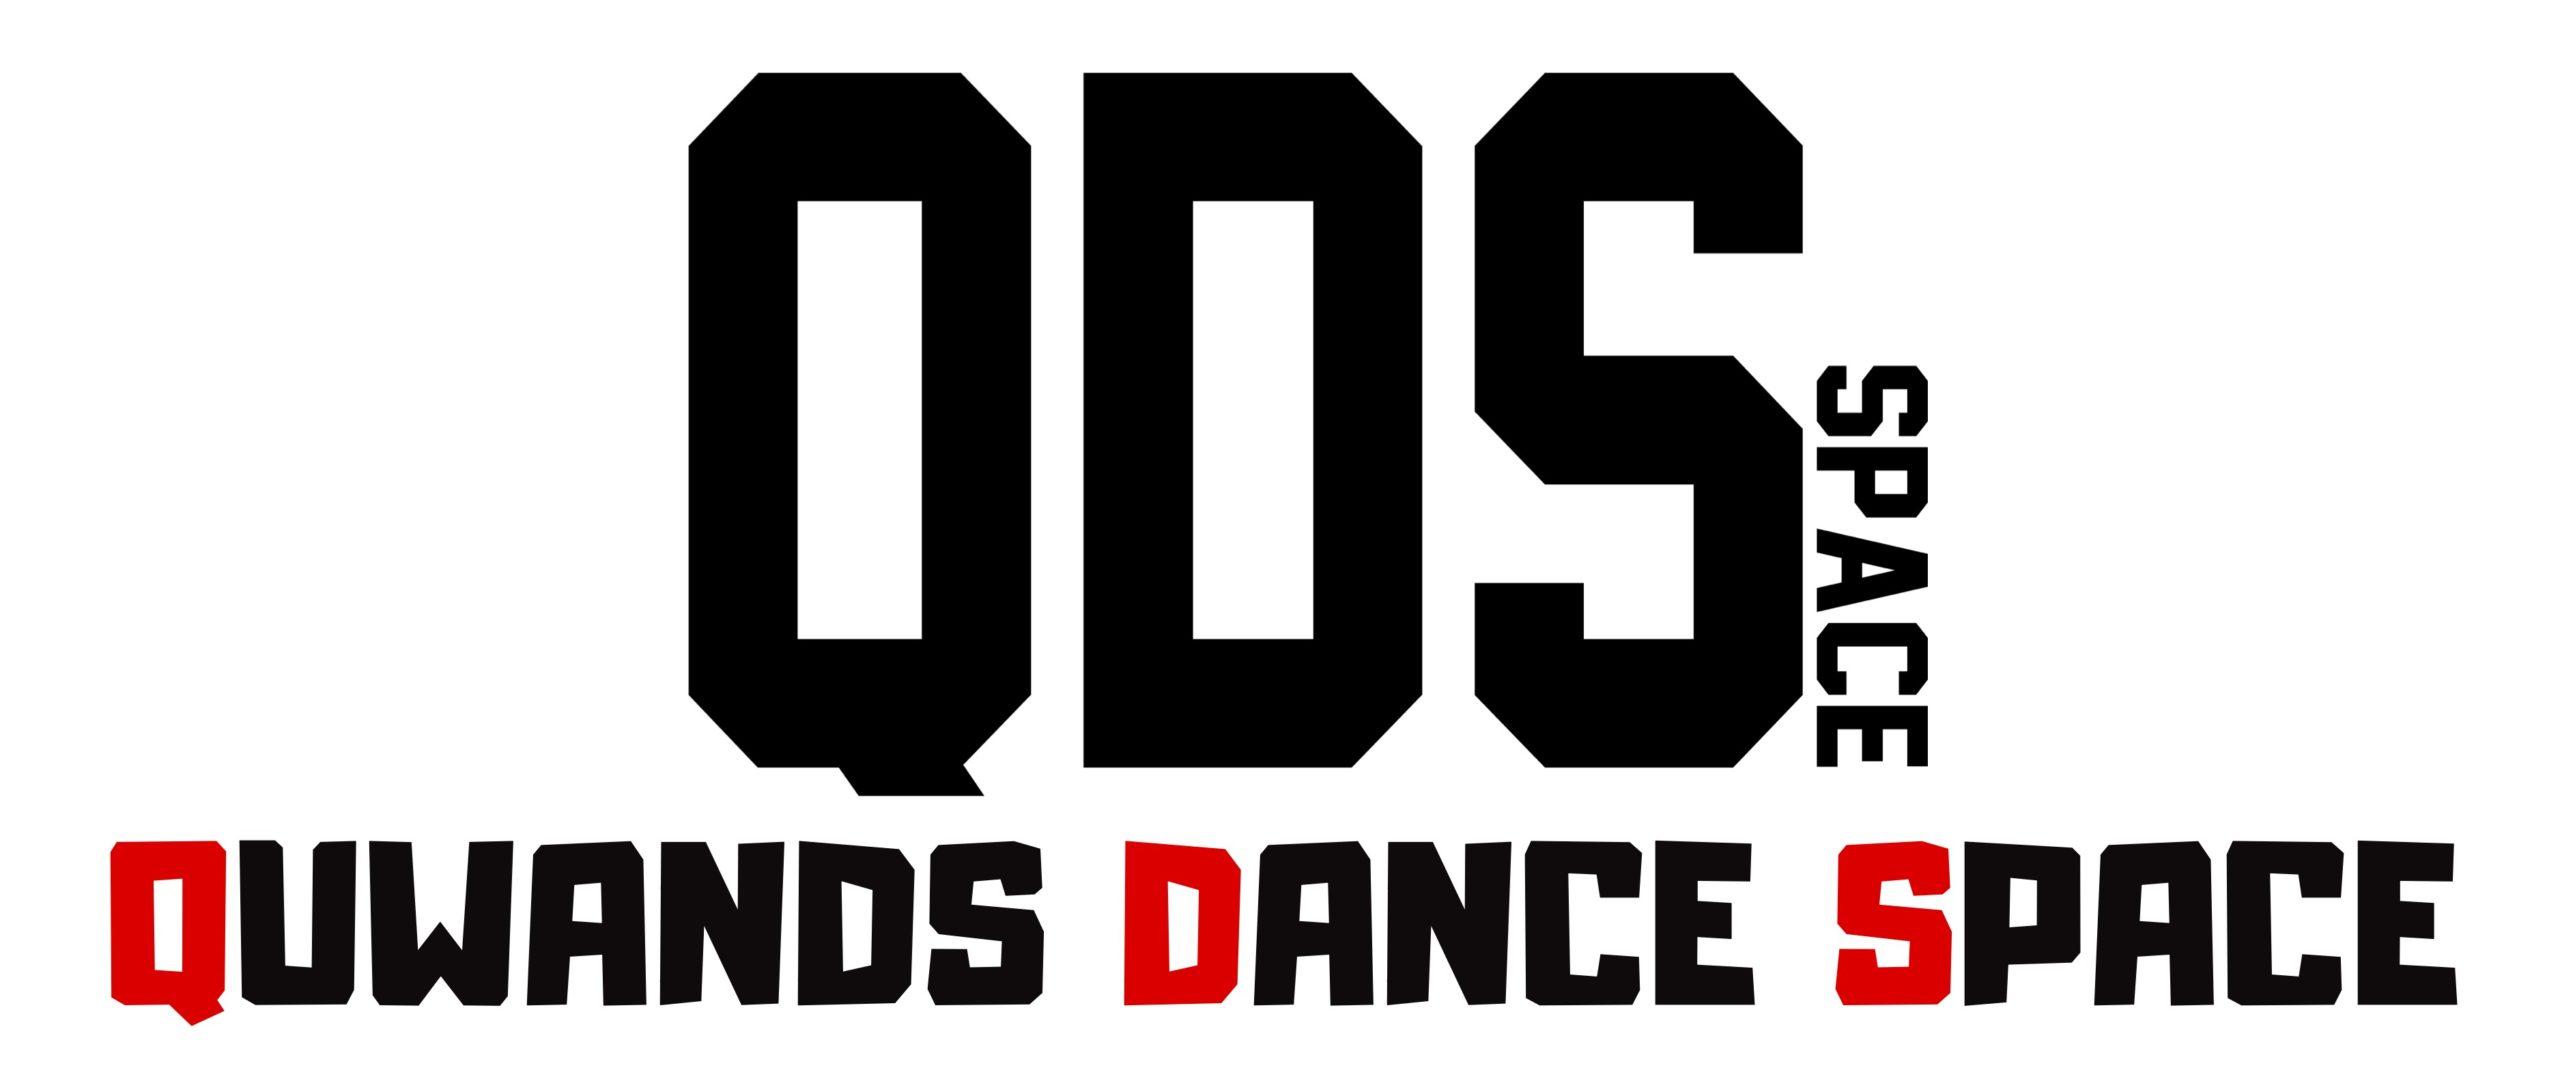 QUWANDS DANCE SPACE 砂町銀座スタジオ